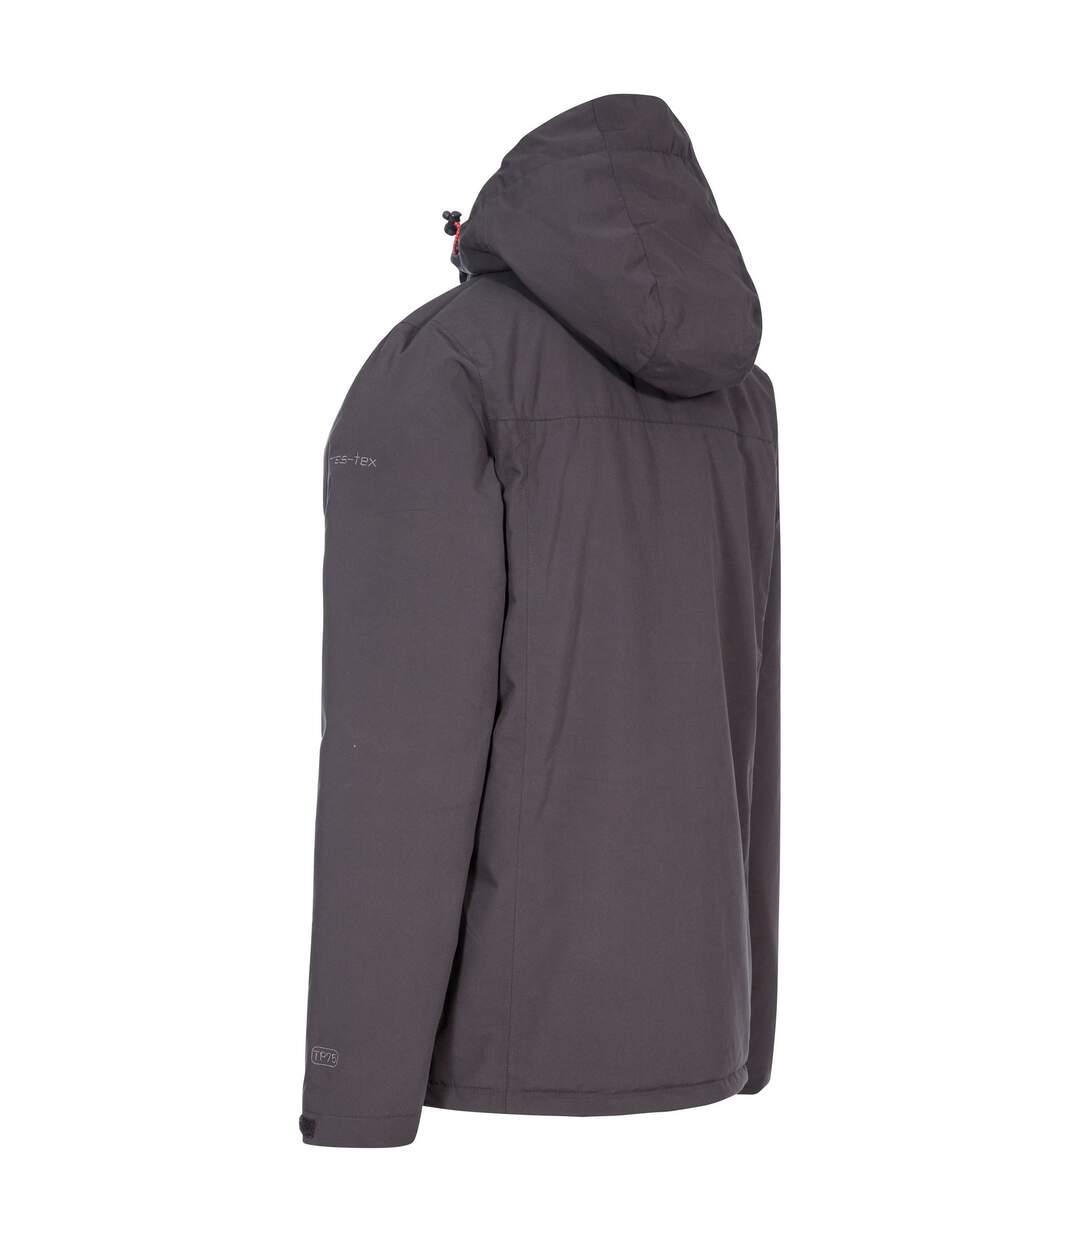 Trespass Mens Toffit Waterproof Jacket (Dark Grey) - UTTP4757